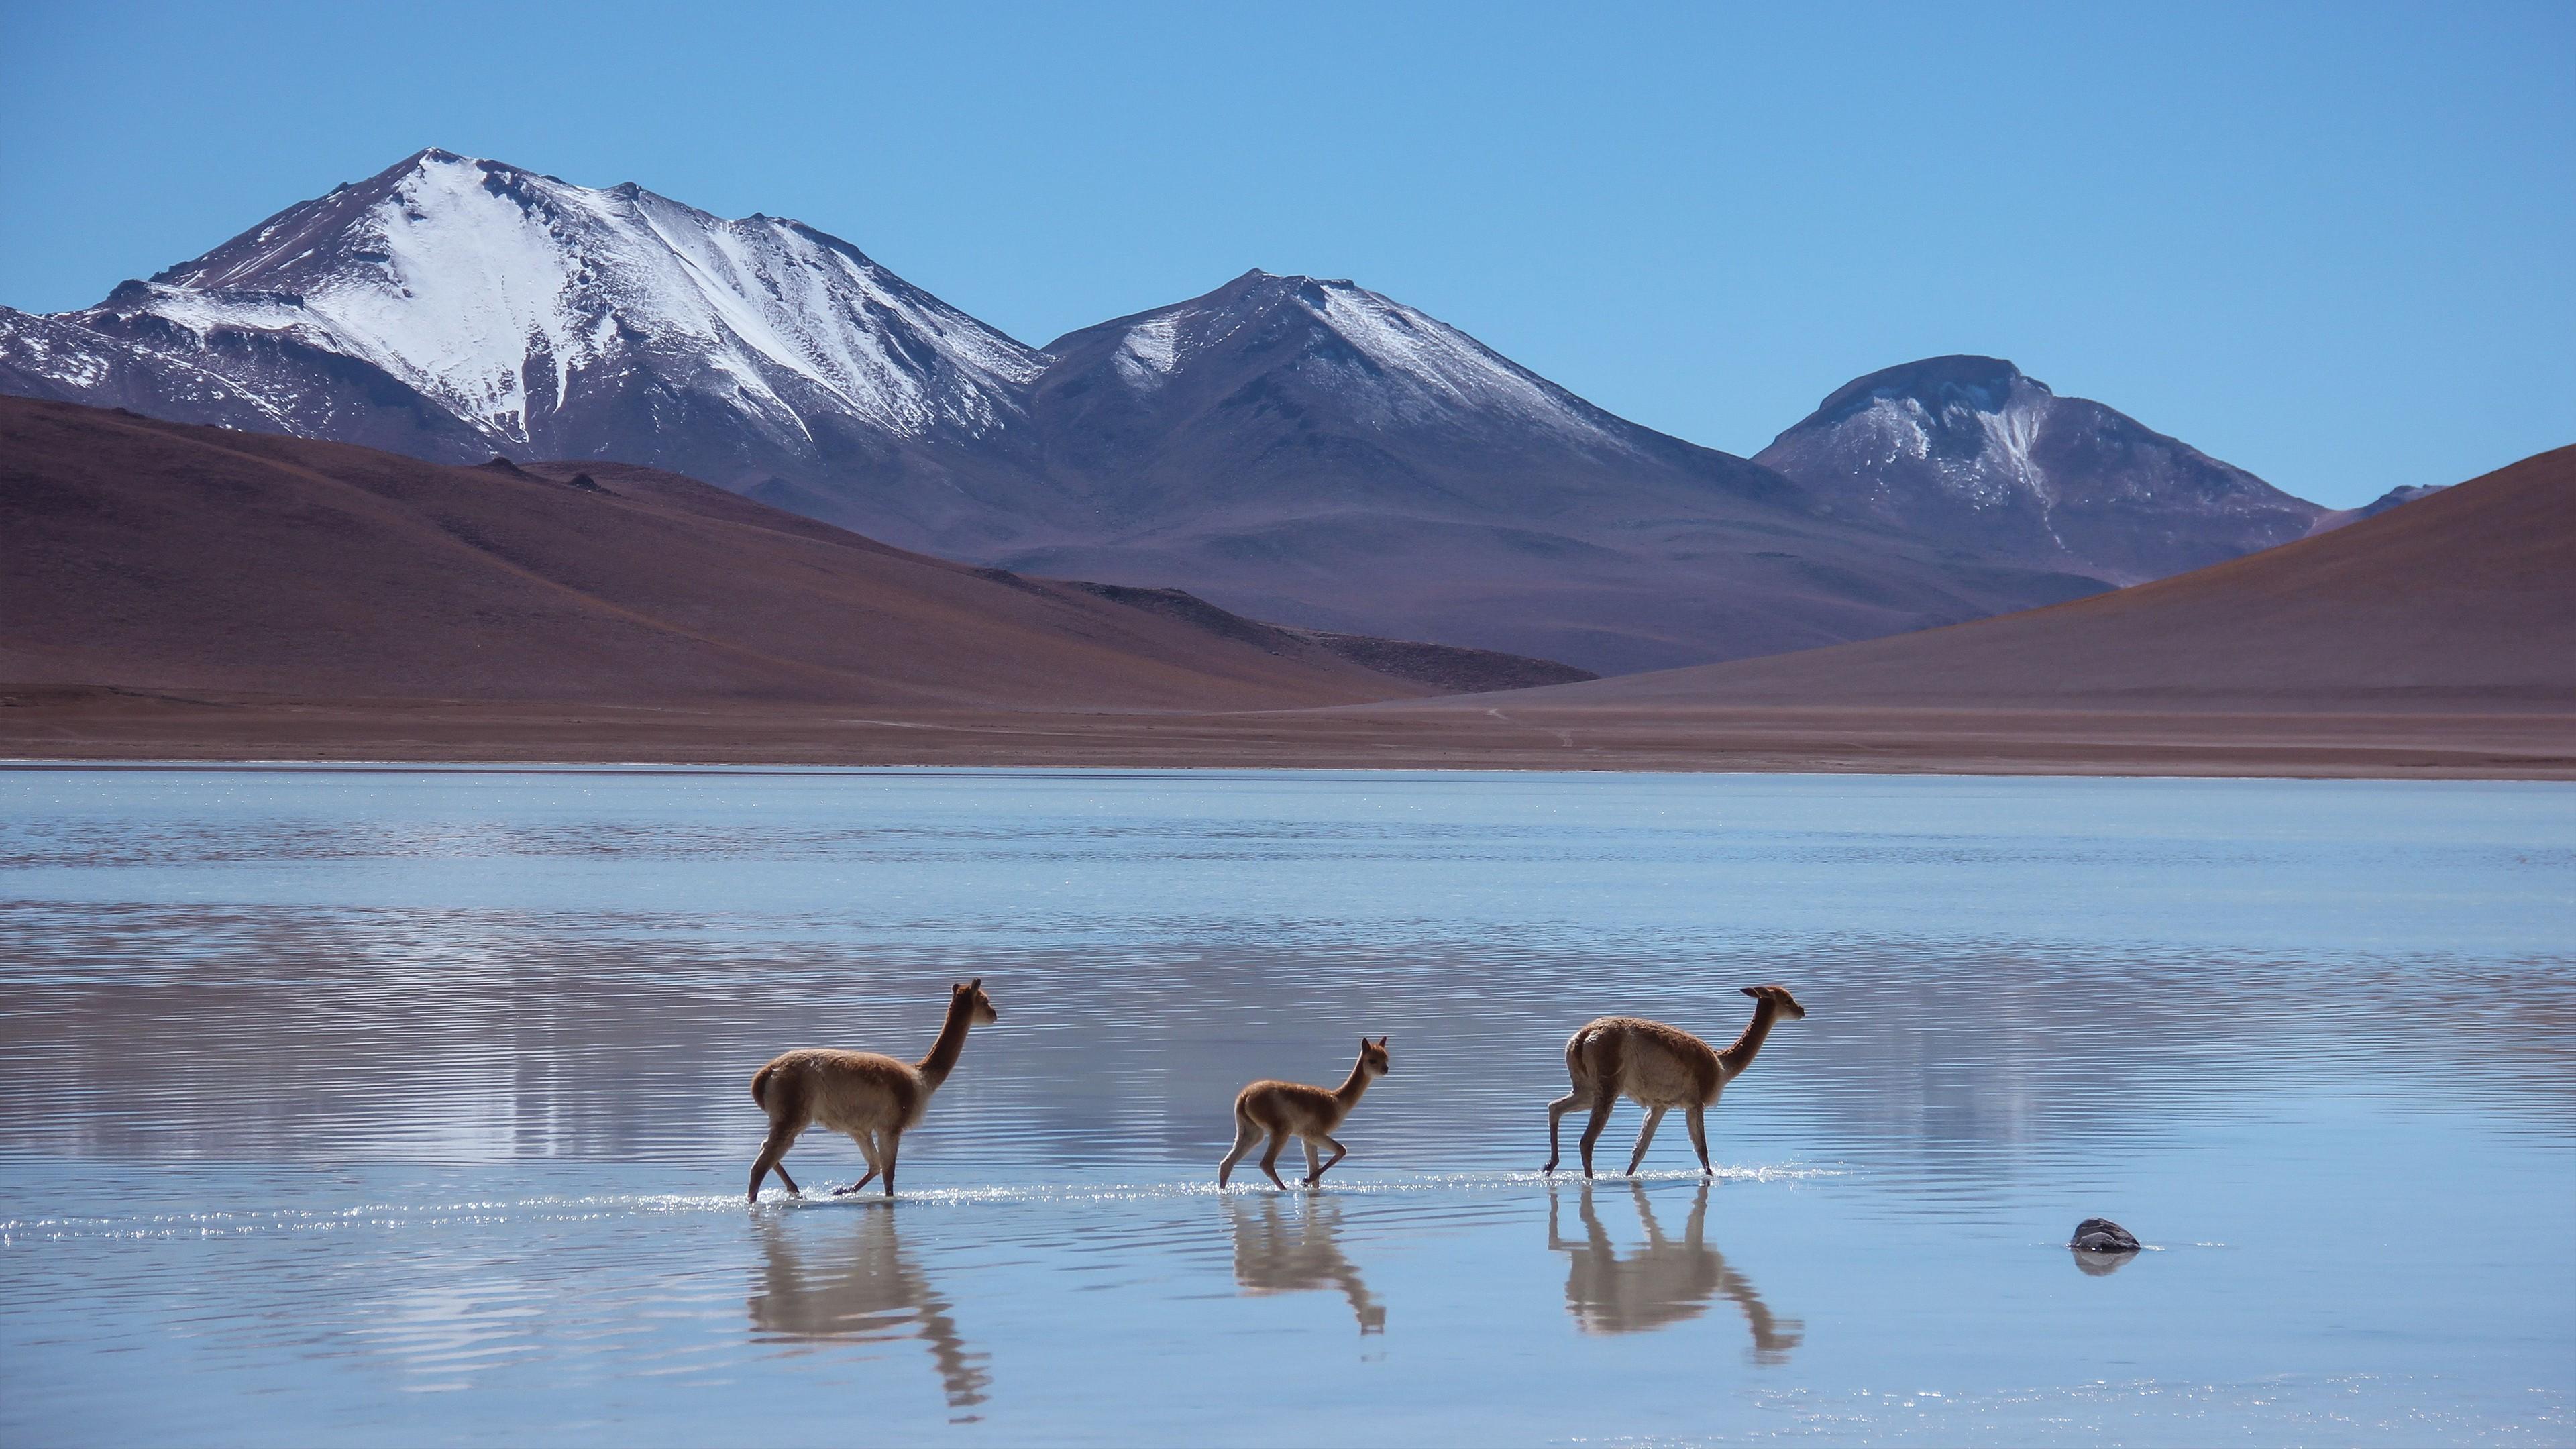 Wallpaper Lama Laguna Blanca Bolivia mountains Animals 8320 3840x2160